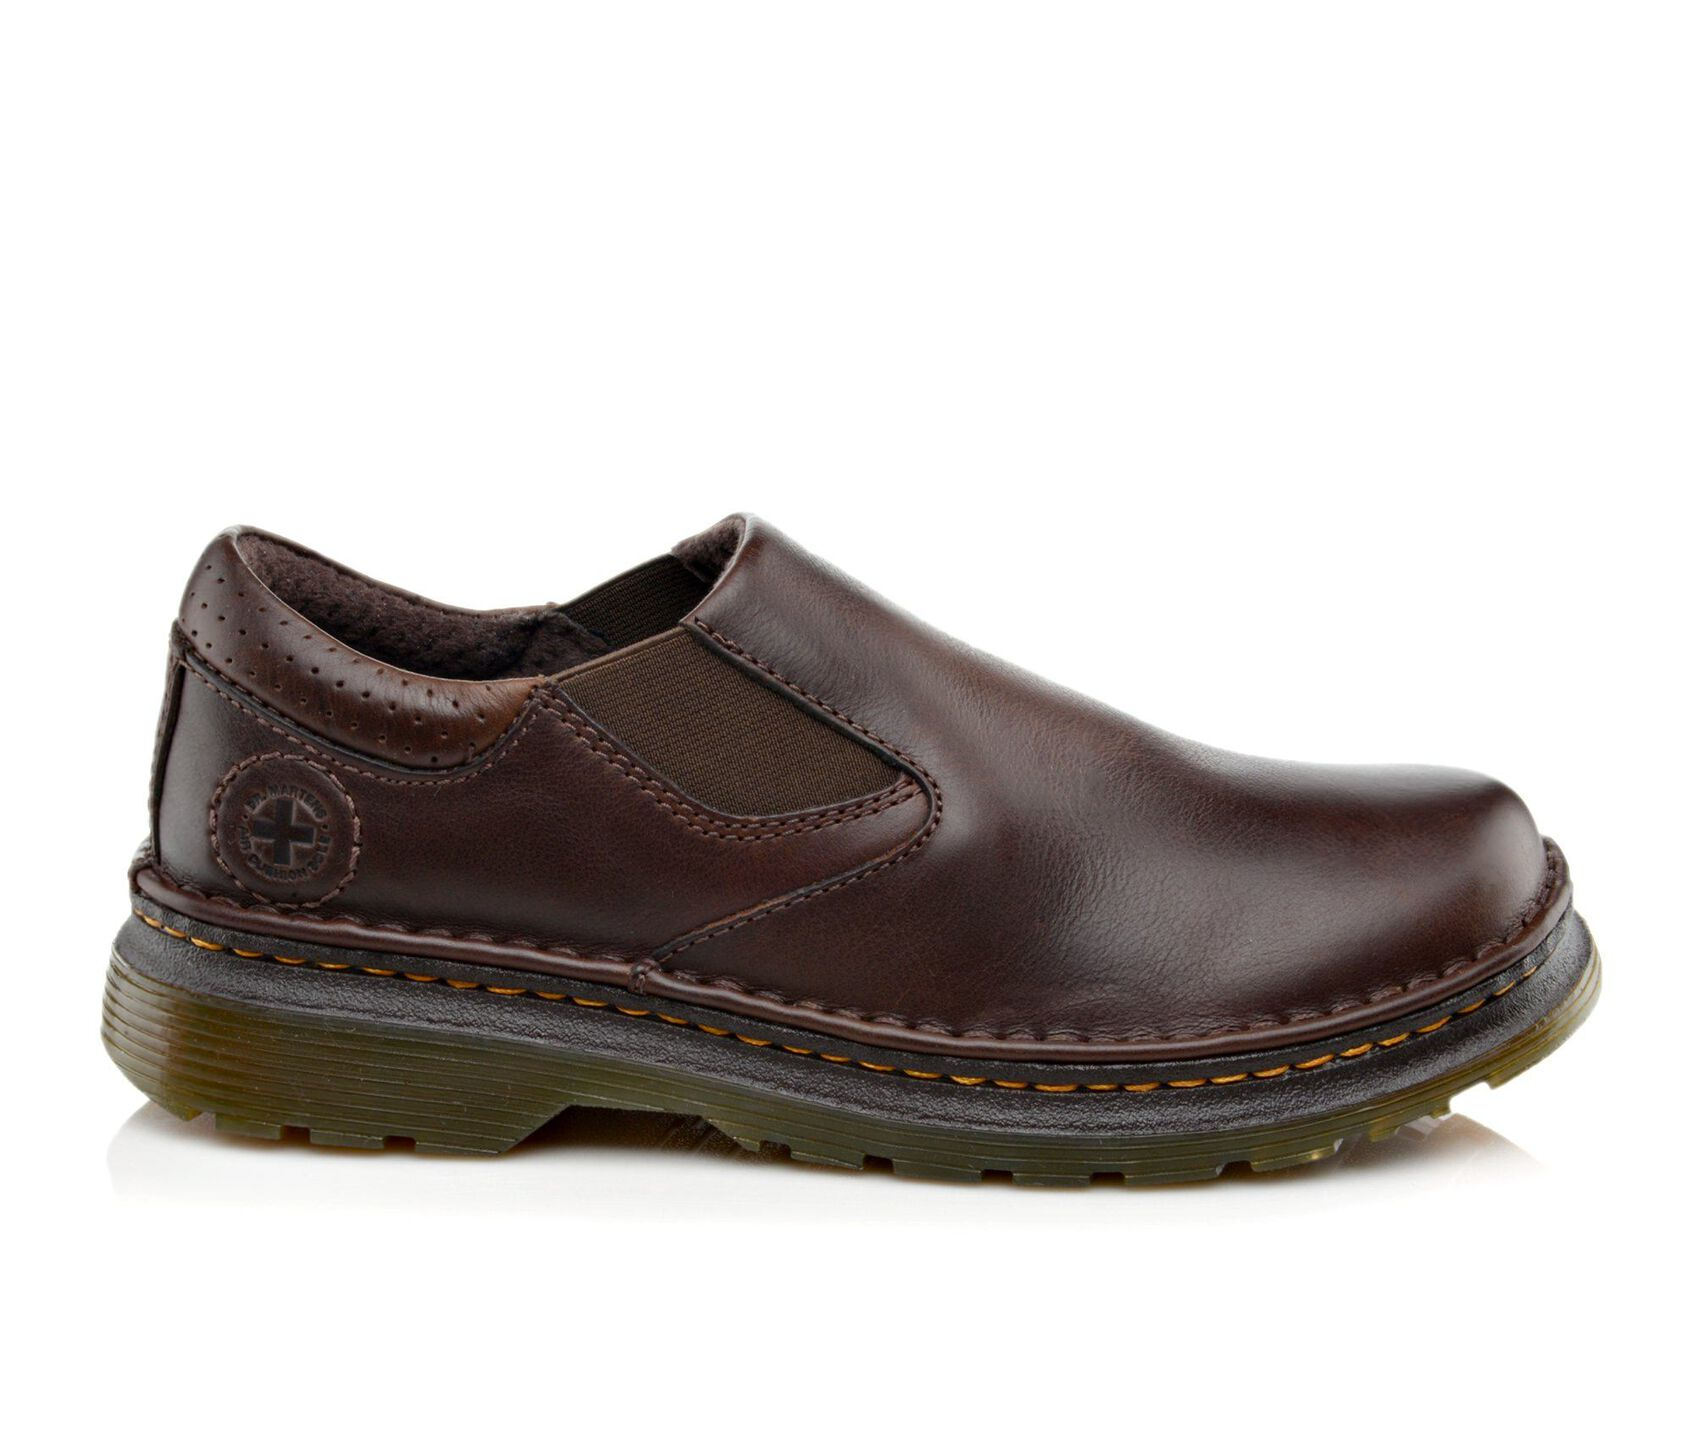 62c6f9b8cd2 Men s Dr. Martens Orson Slip On Plain Toe Loafers